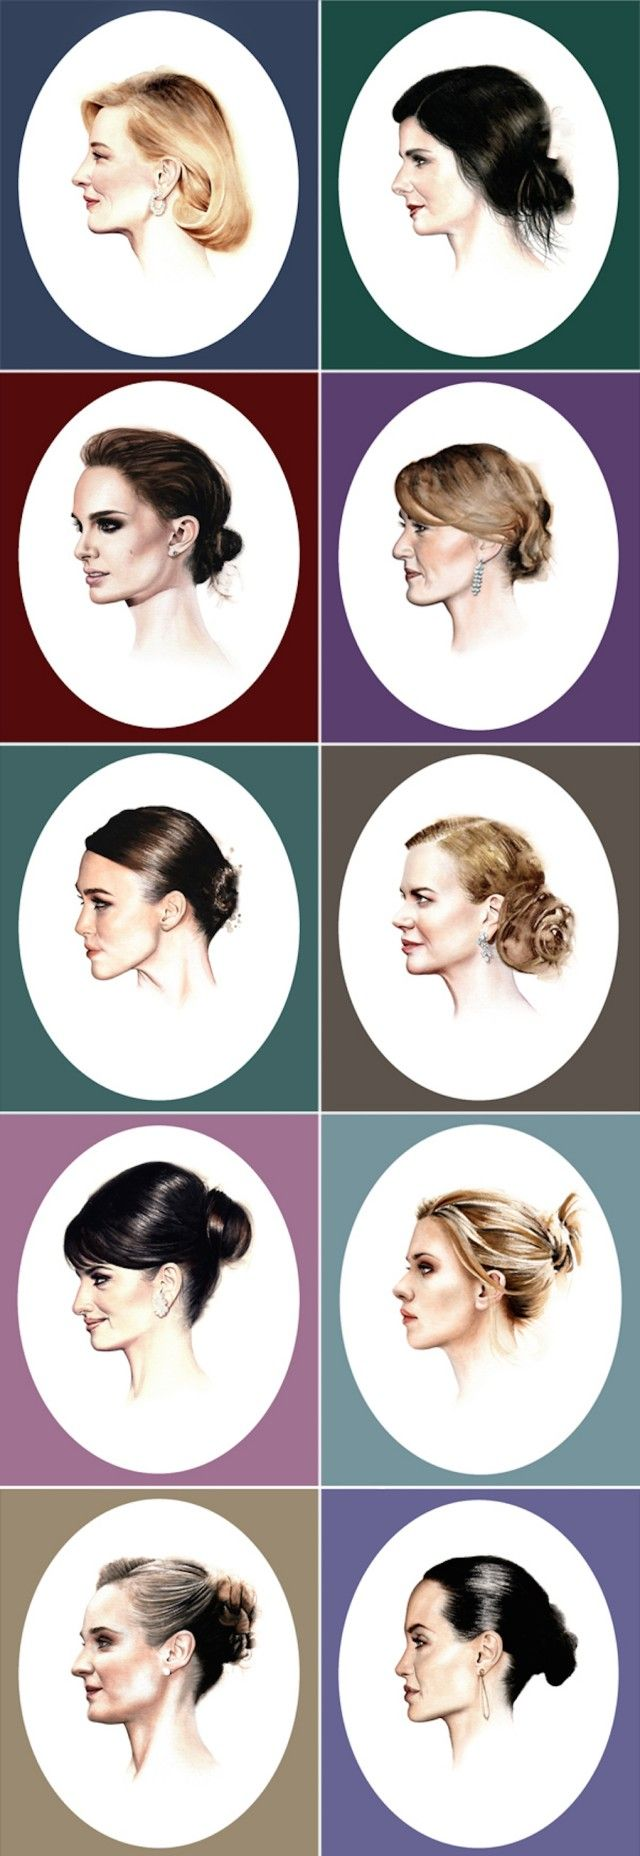 Davide Morettini's Watercolor Portraits of Hollywood Actresses – Fubiz™